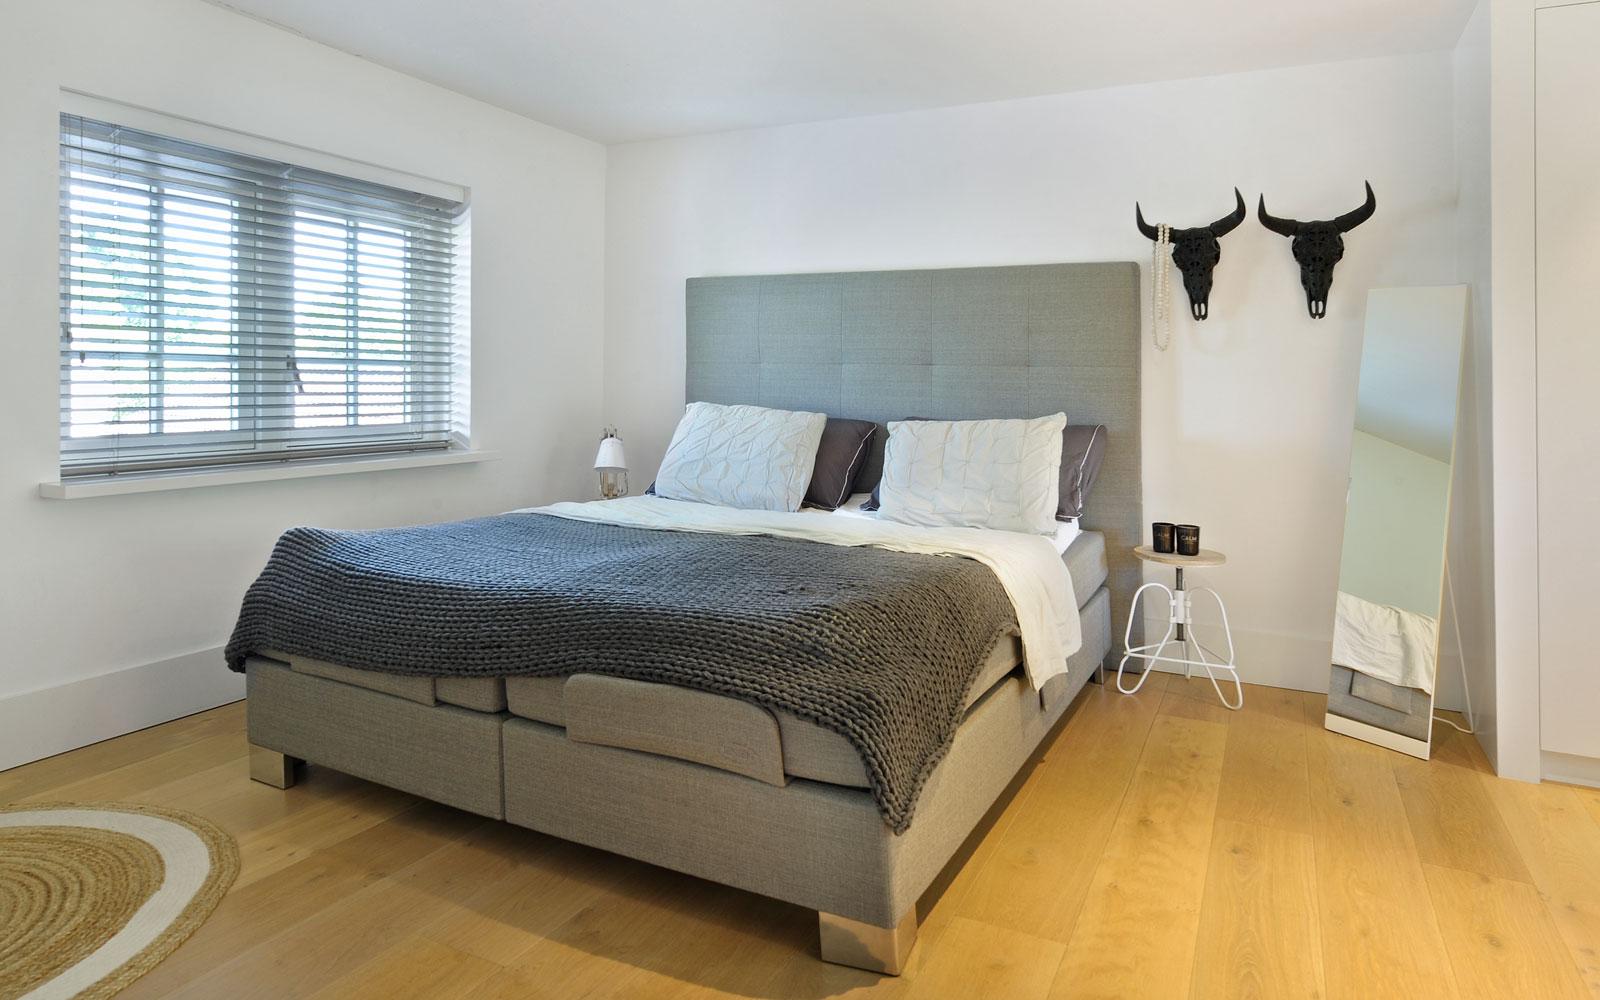 Slaapkamer, bed, master bedroom, houten vloer, shutters, metamorfose, Boxxis Architecten